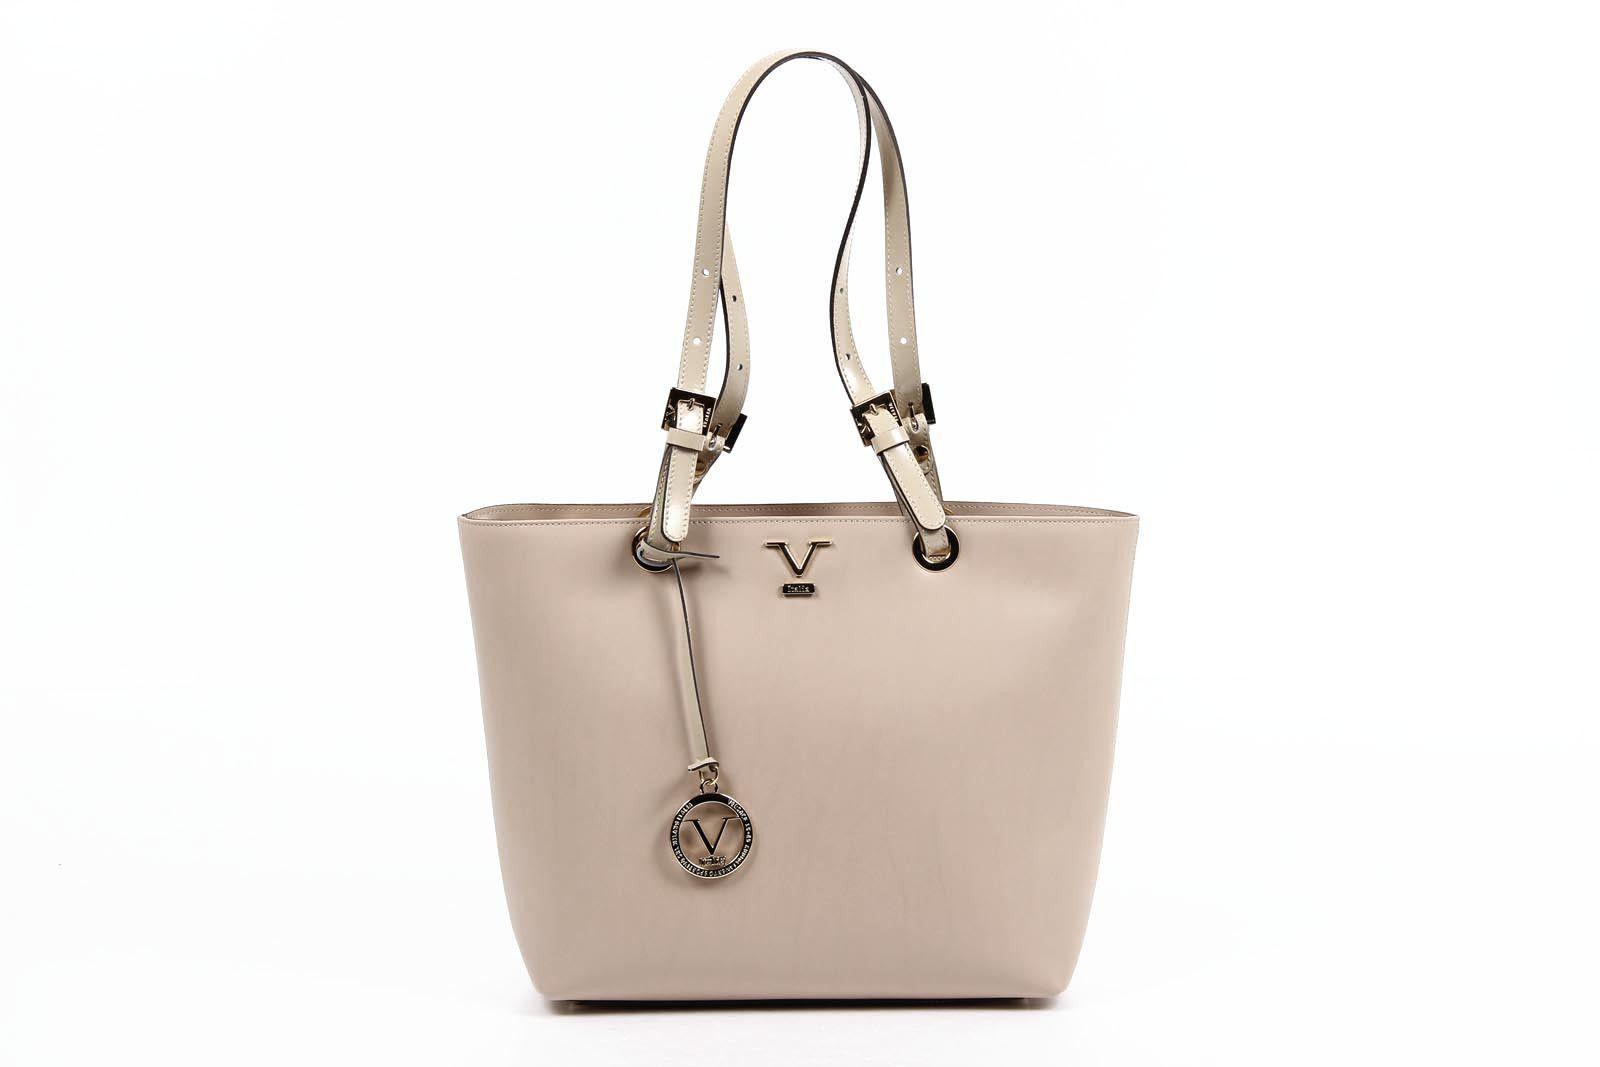 2f6d7e545ae Versace 19.69 Abbigliamento Sportivo Srl ladies handbag E250 52  RUGA SPECCHIO CARNE 476